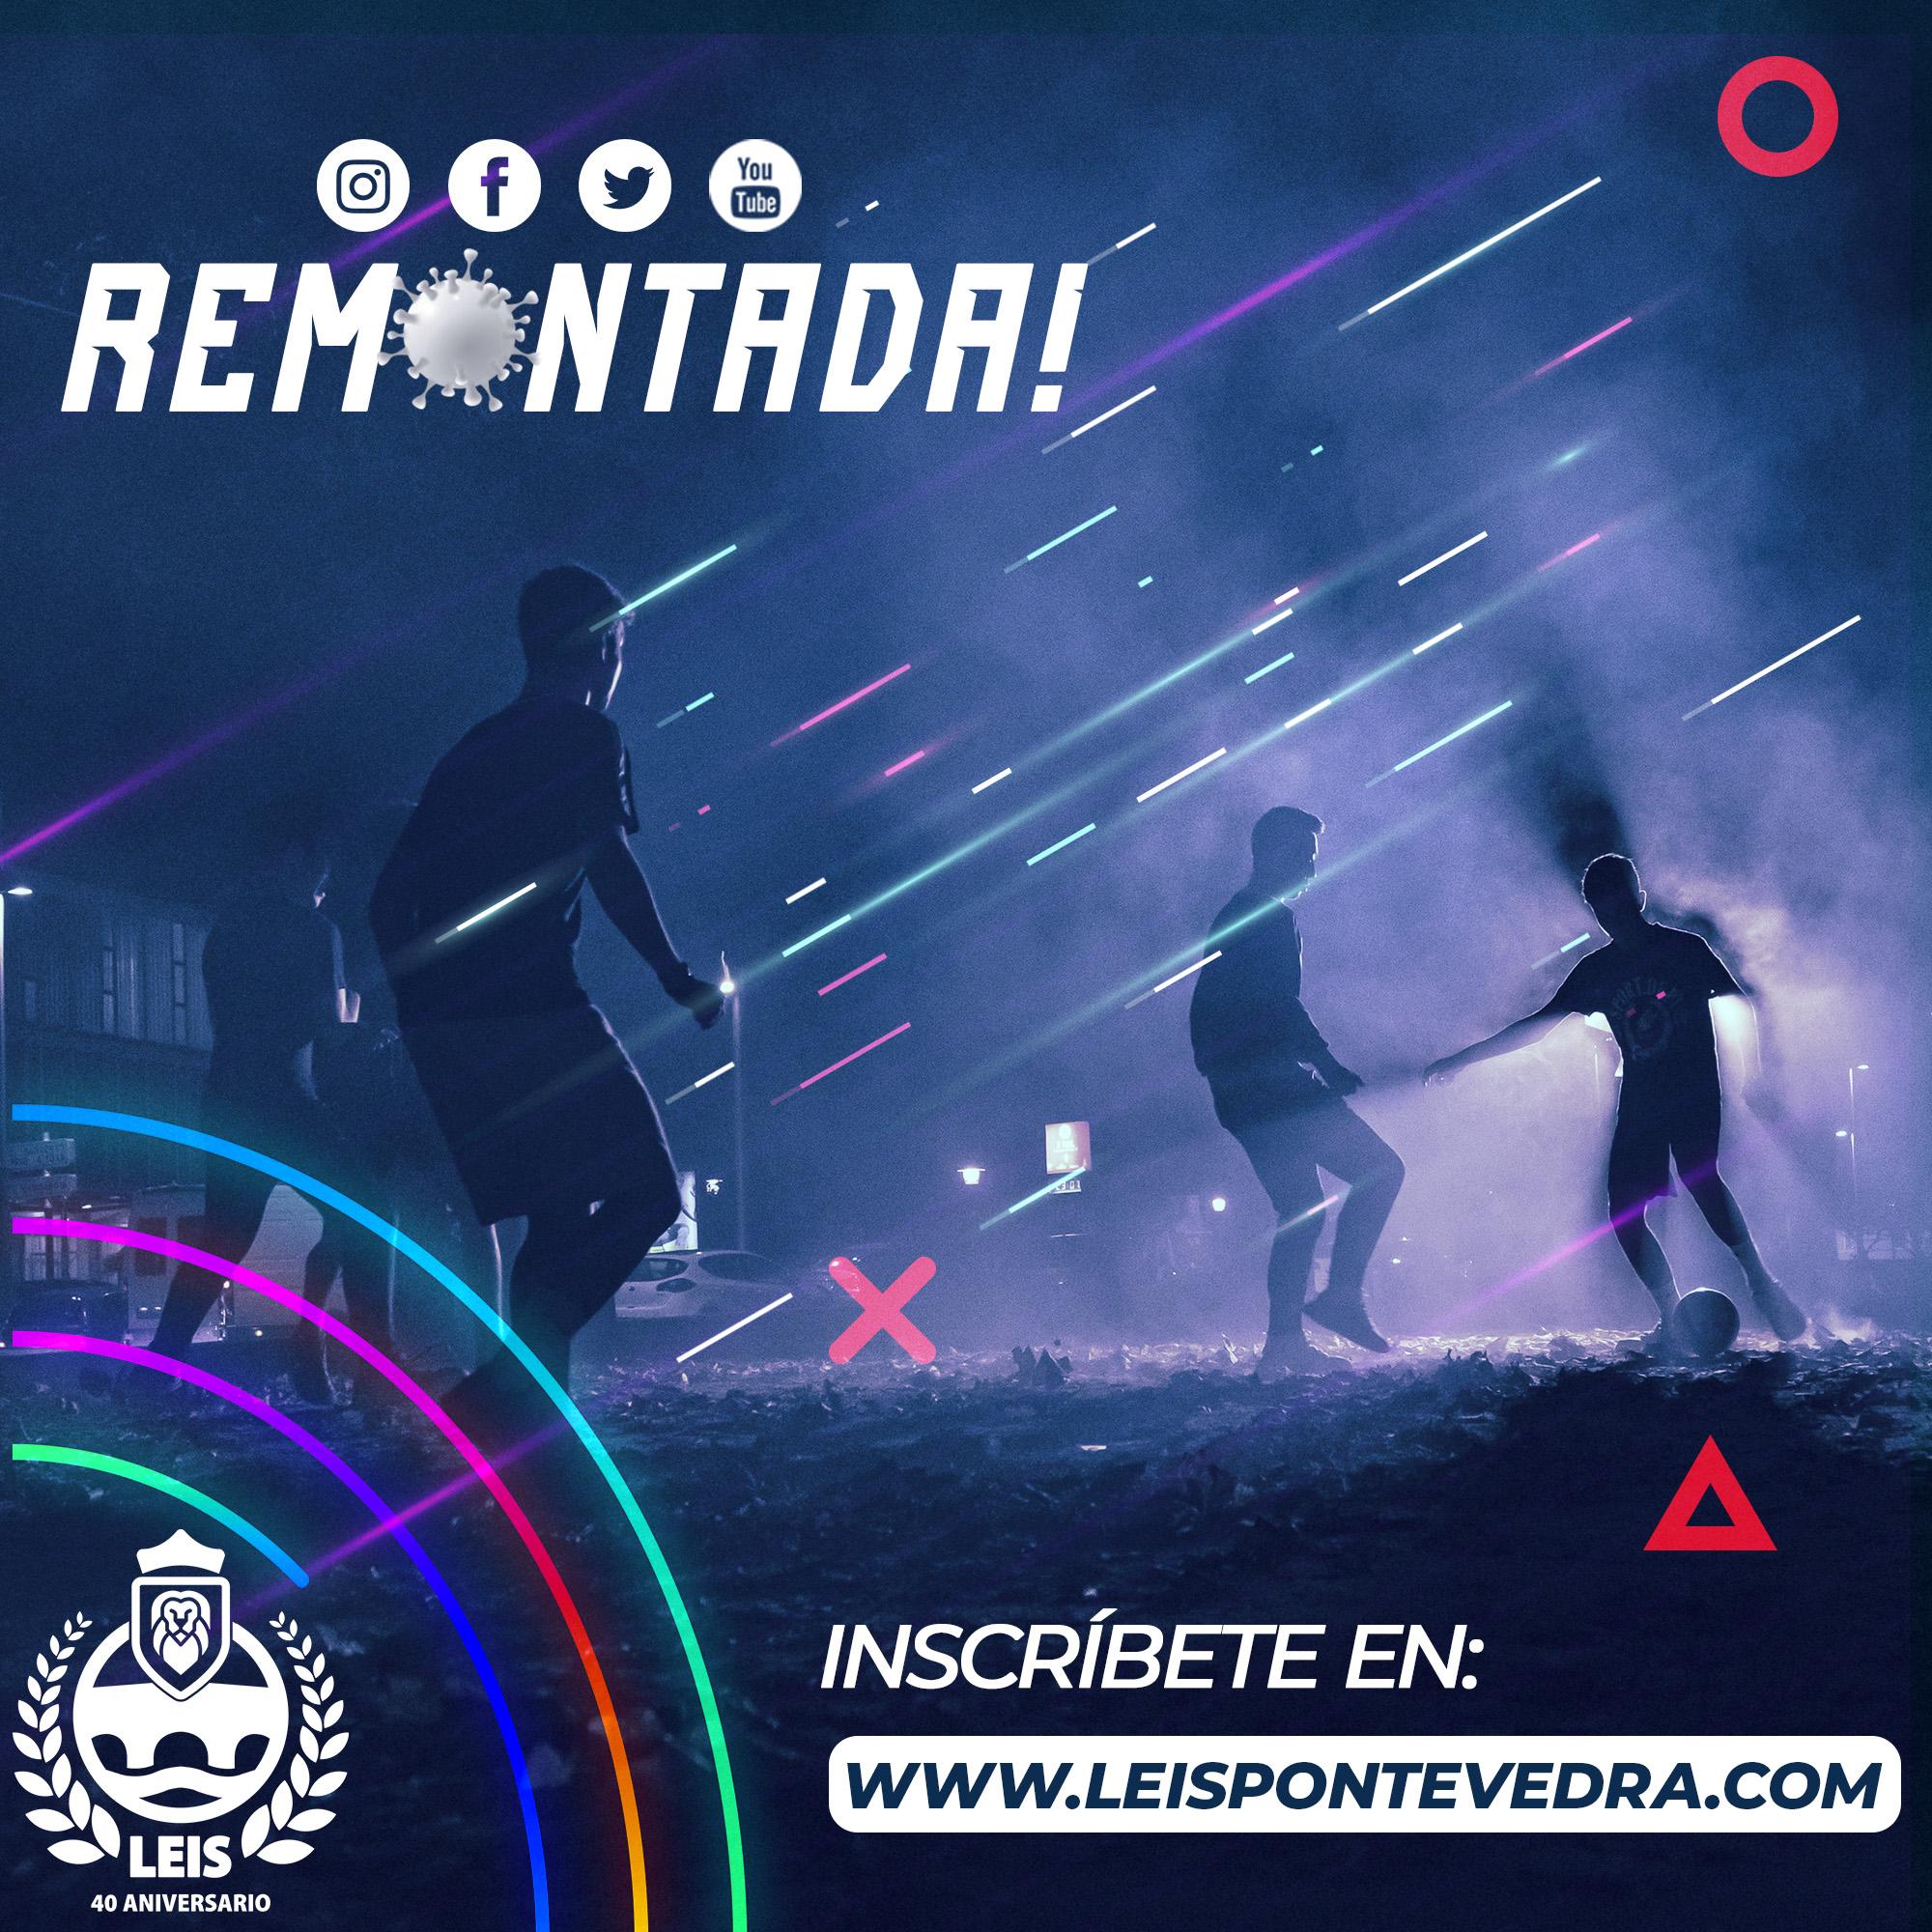 #Remontada! Jugadores